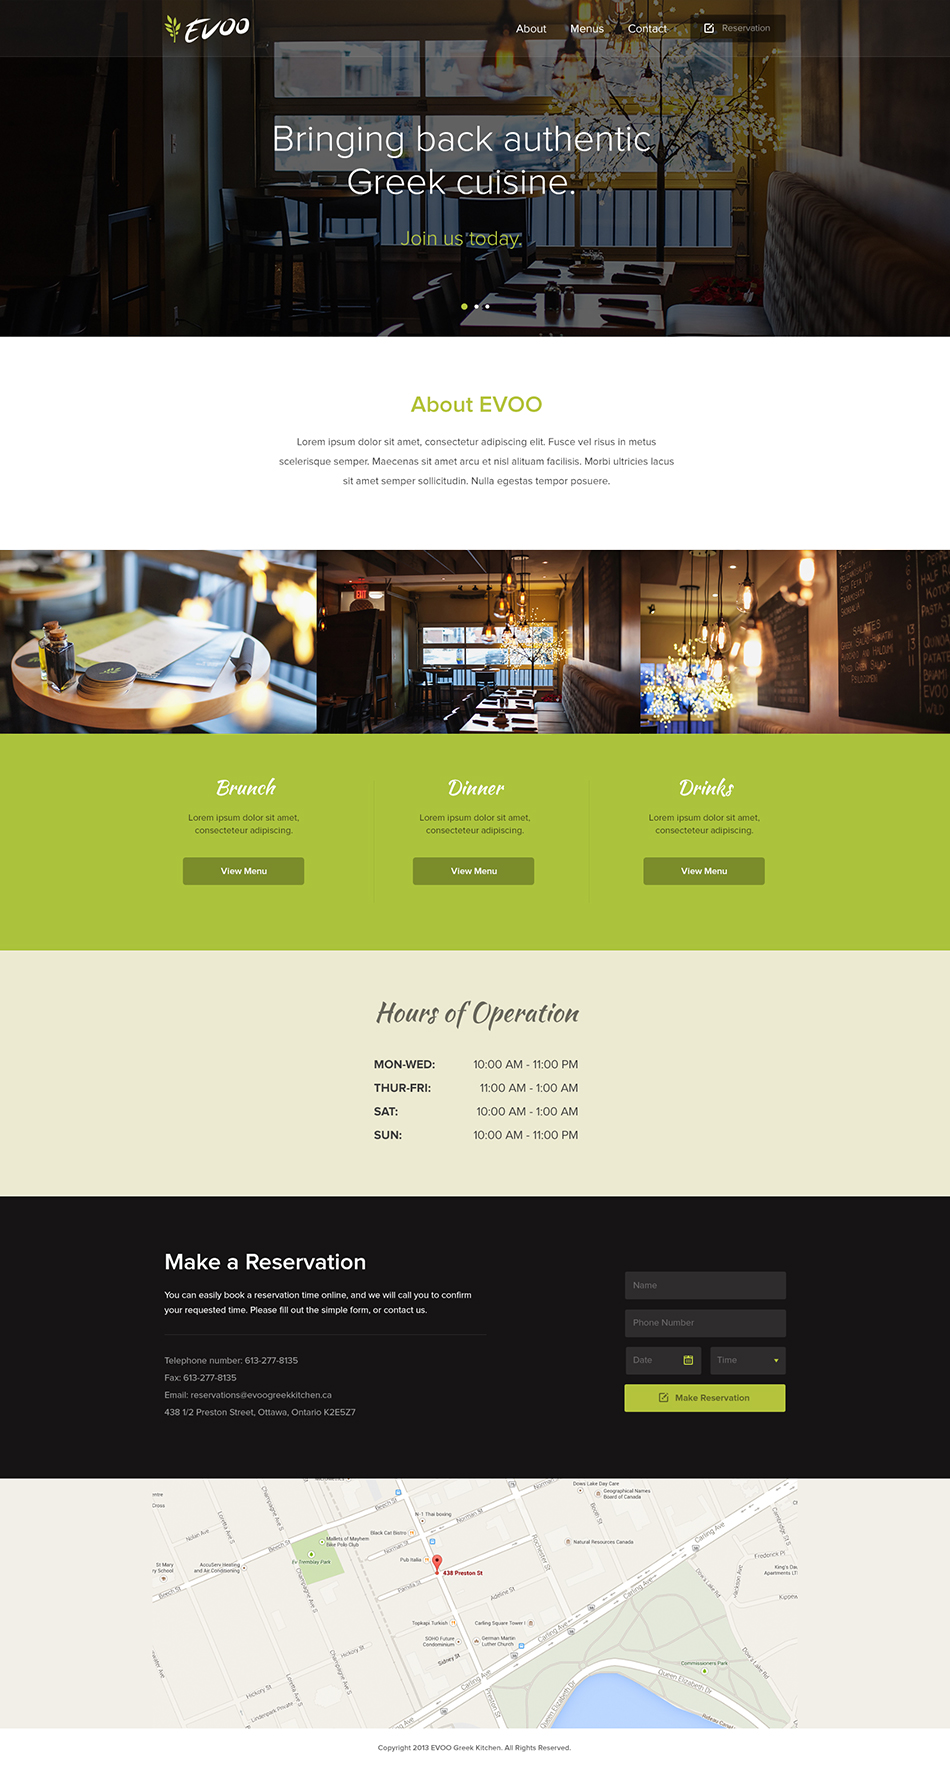 JPBrown-EVOO-WebDesign